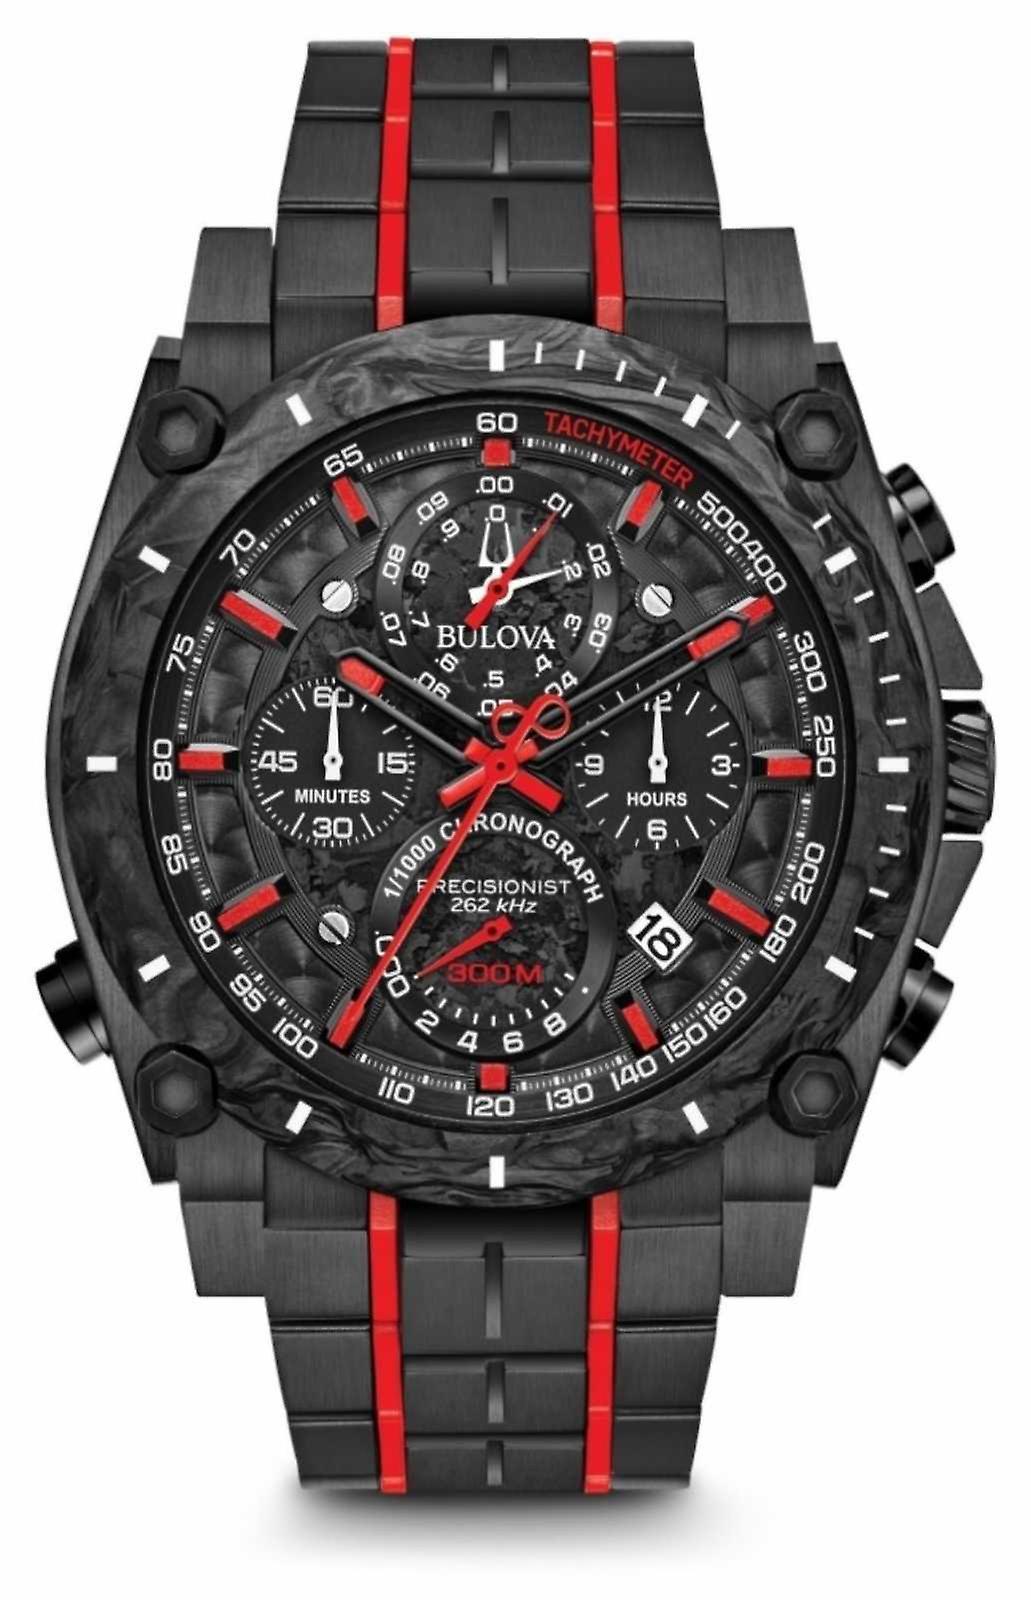 Bulova Precisionist Chronograph Black Red UHF 98B313 Watch